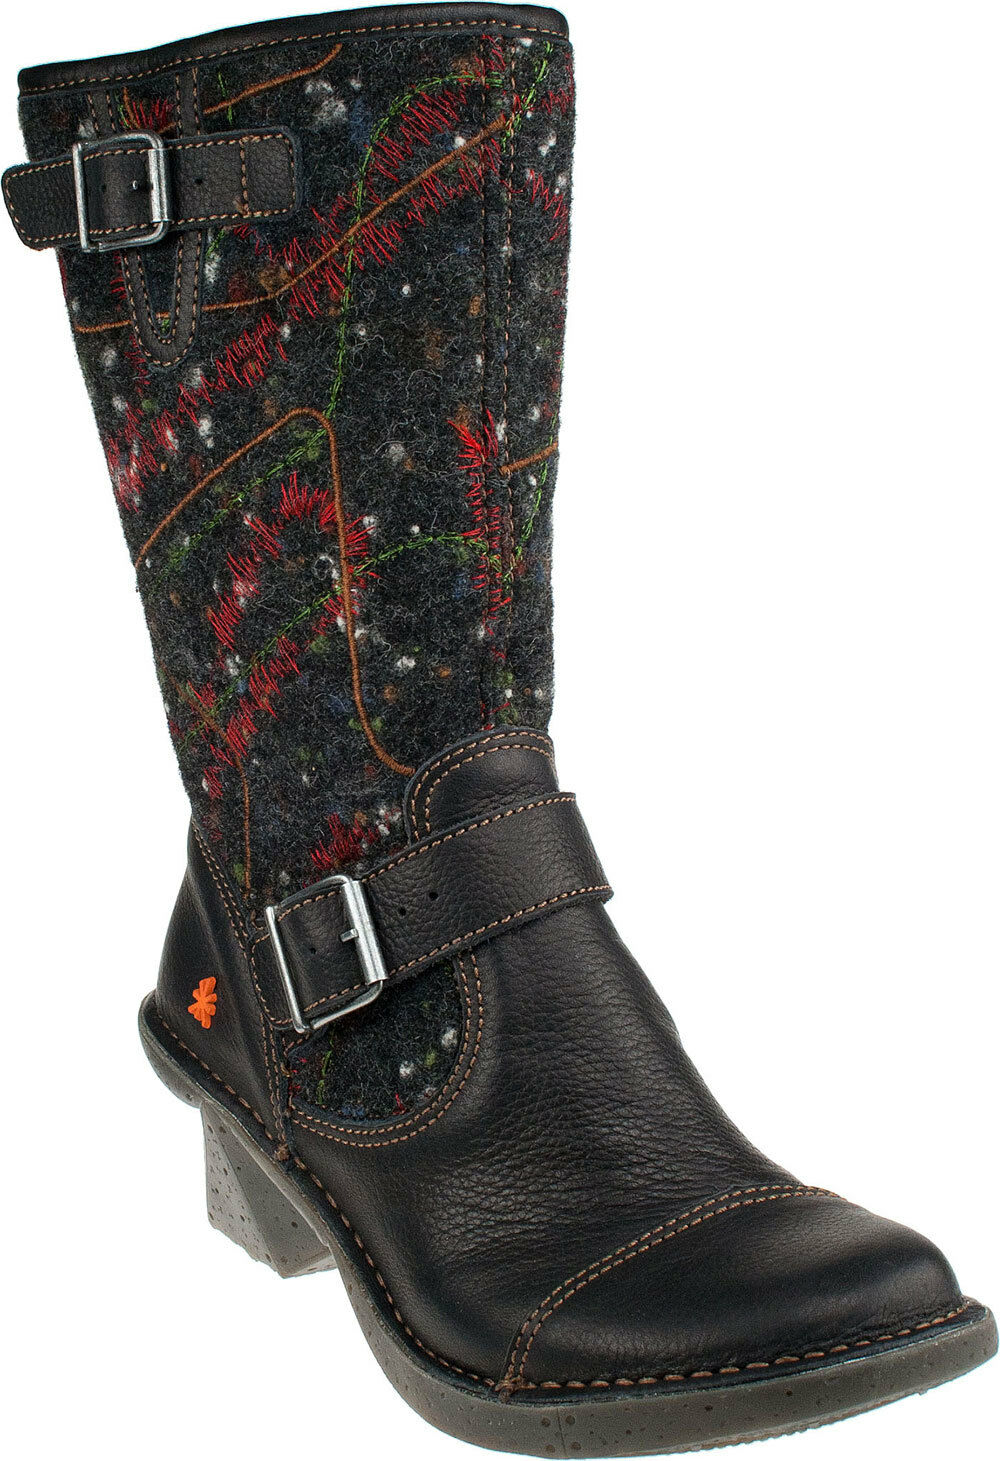 The ART Company Damenschuhe Schuhe Oteiza 617 Stiefel Stiefelette Boots Leder